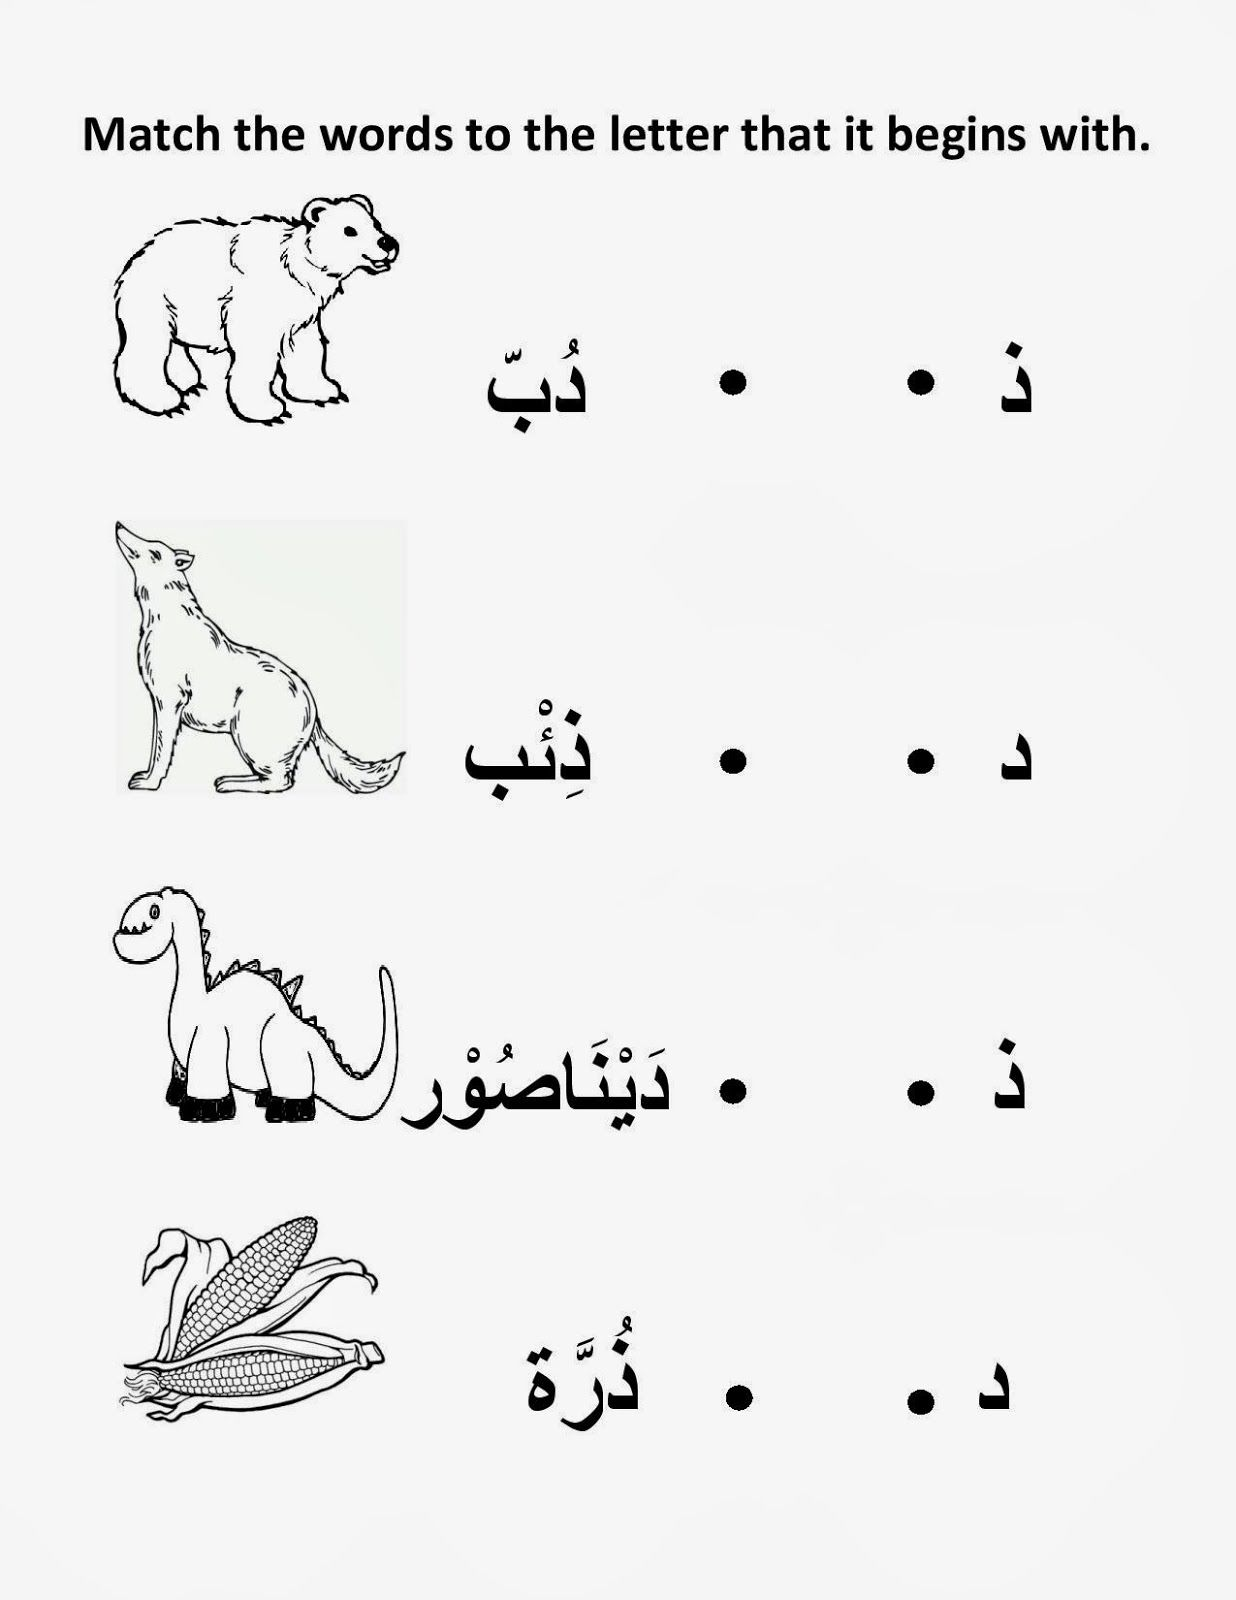 bahasa arab kertas latihan | Arabic teaching | Learn arabic